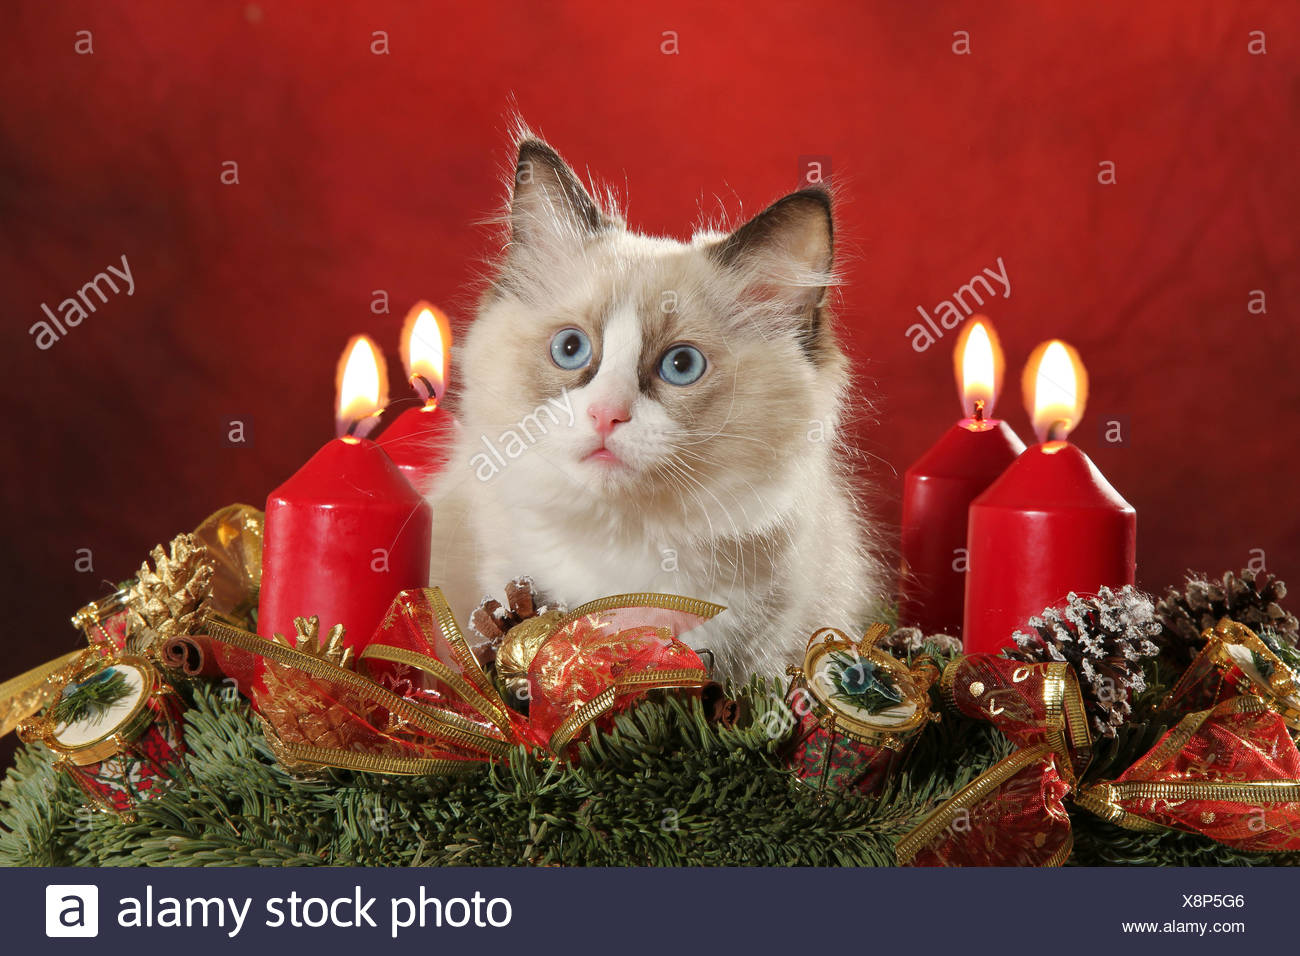 Ragdoll cat - kitten in Advent wreath - Stock Image